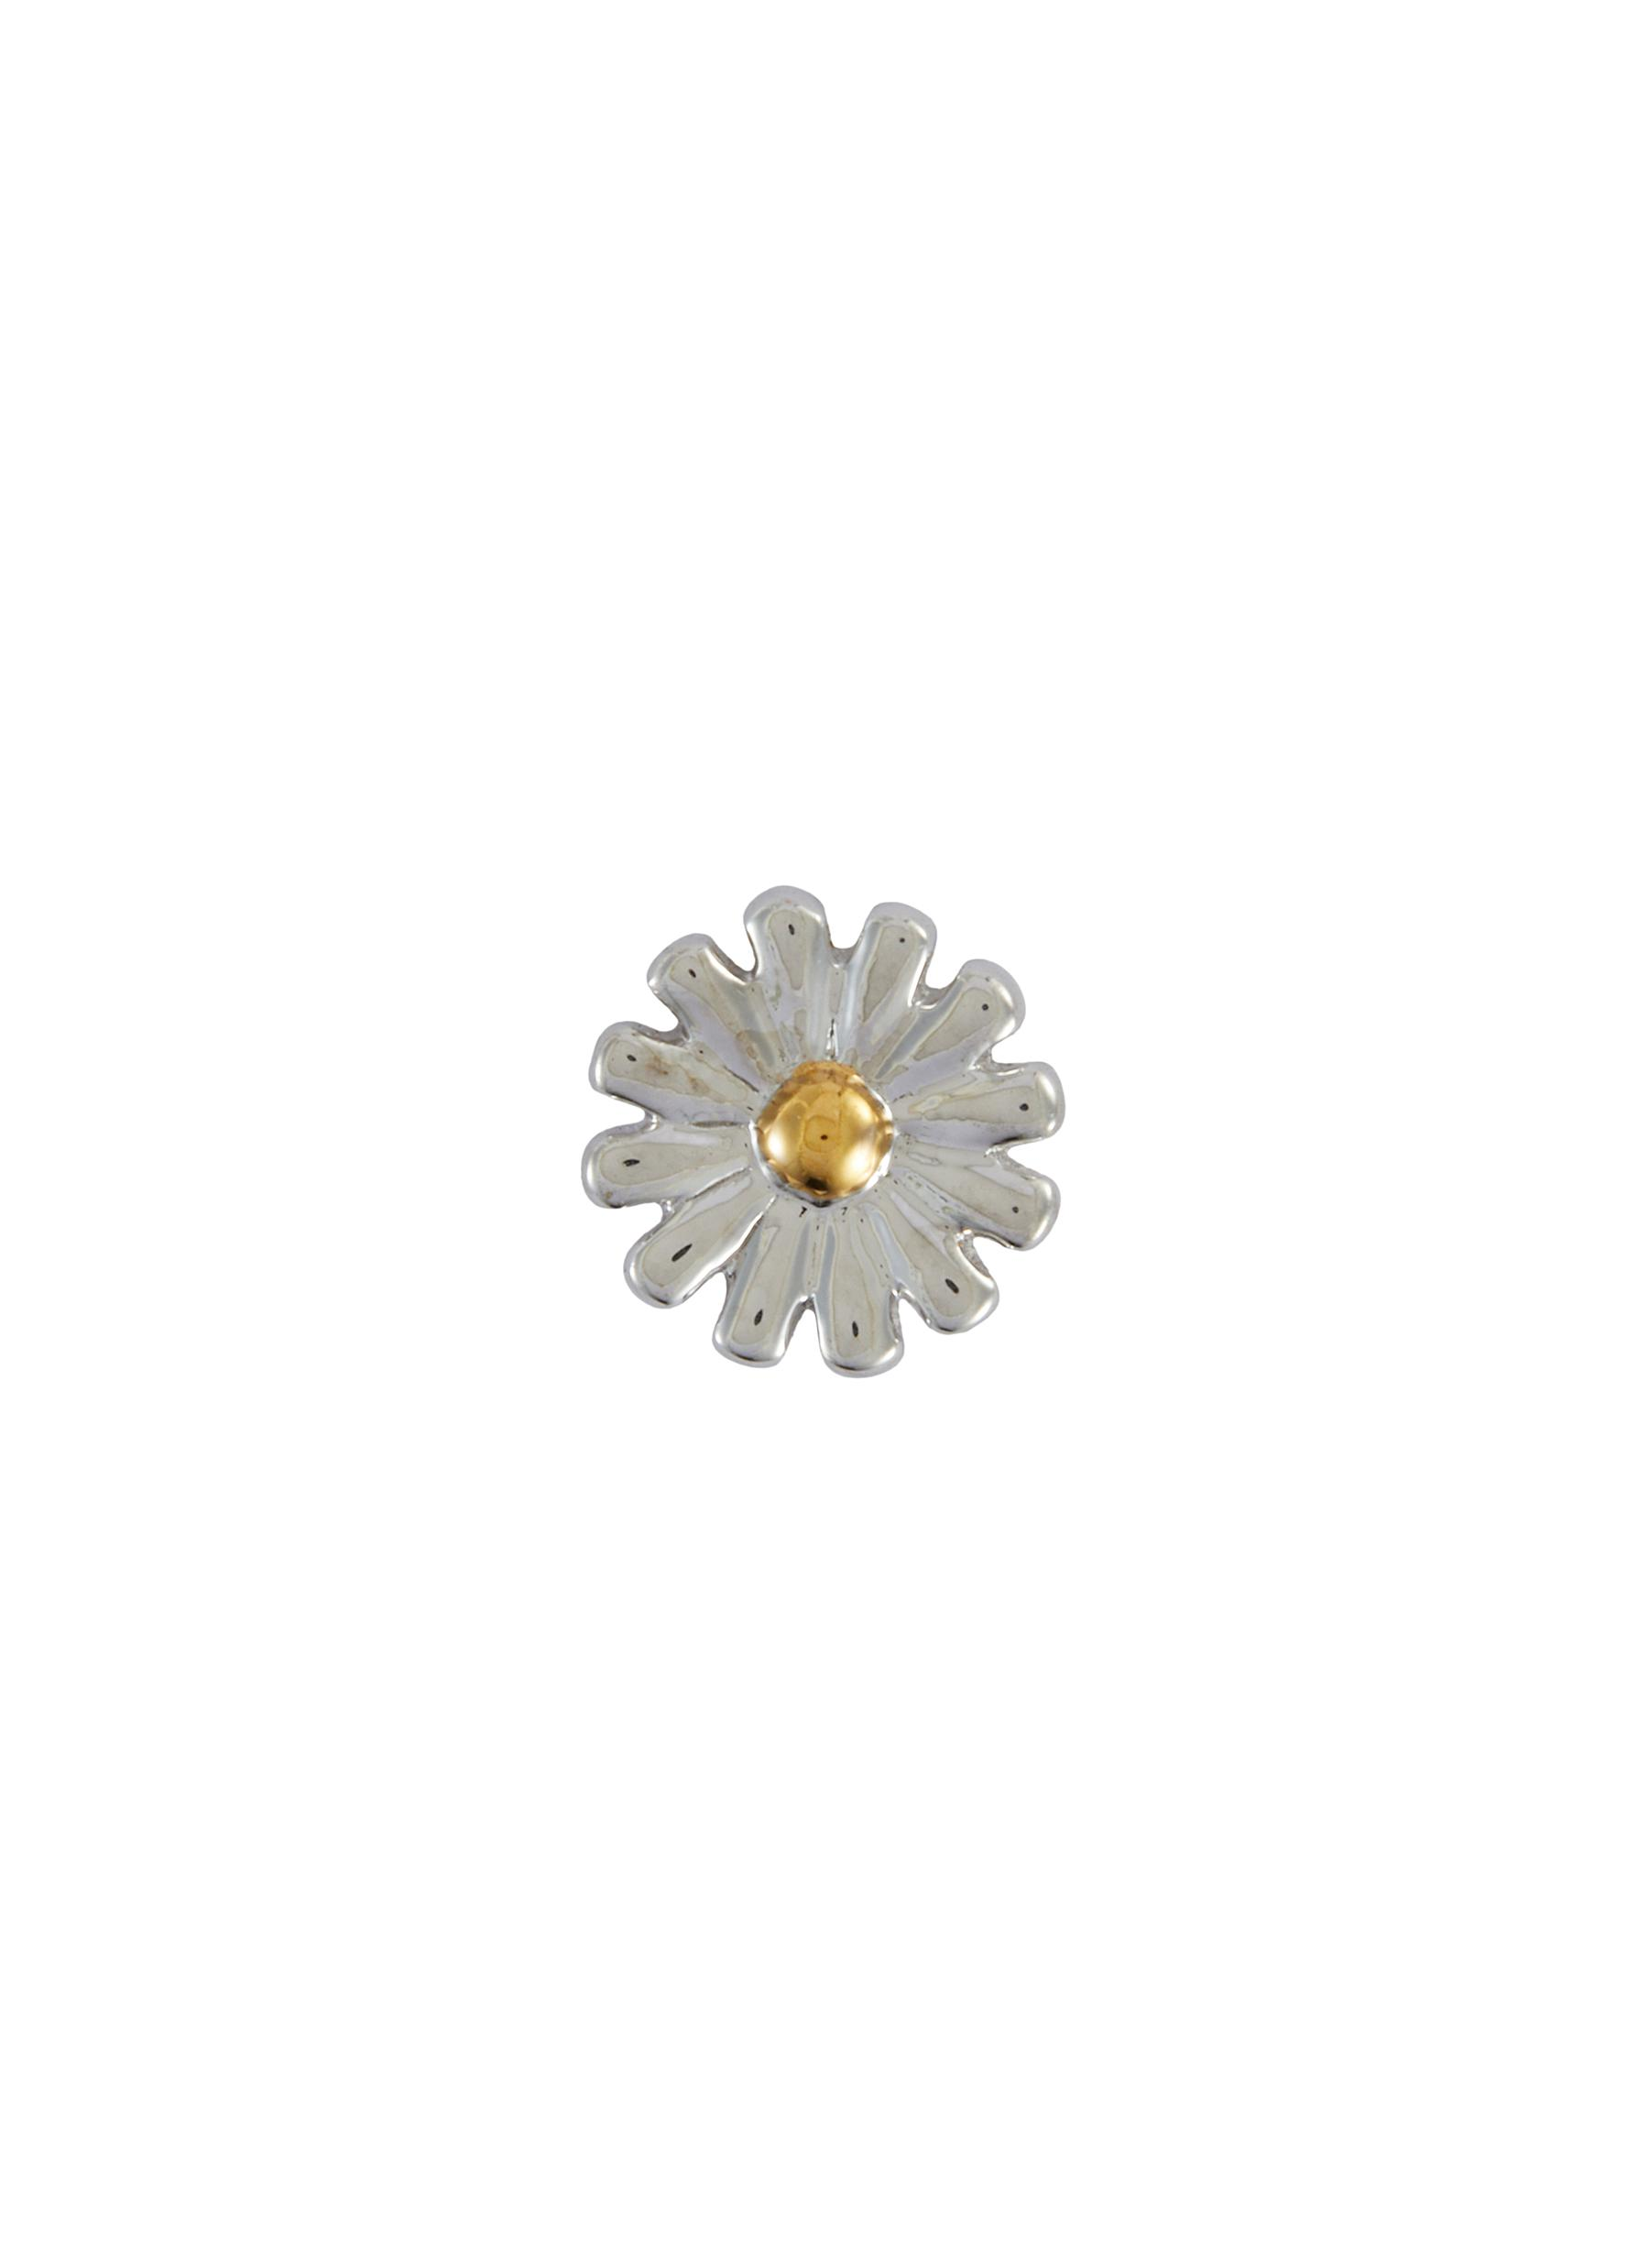 'Daisy' 18k White Gold Enamel Detail Charm